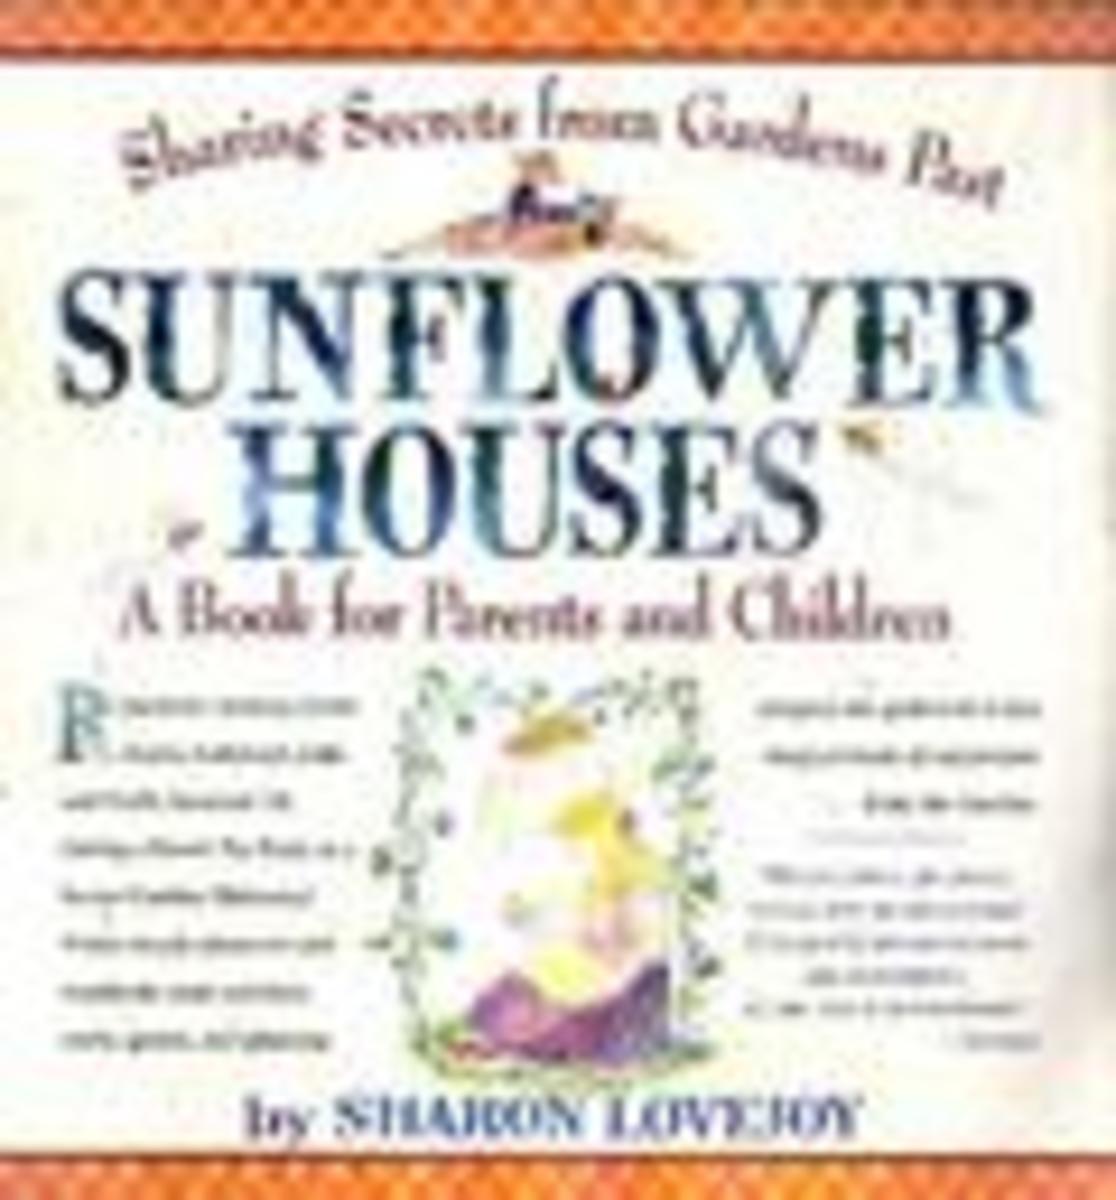 SunflowerHouses